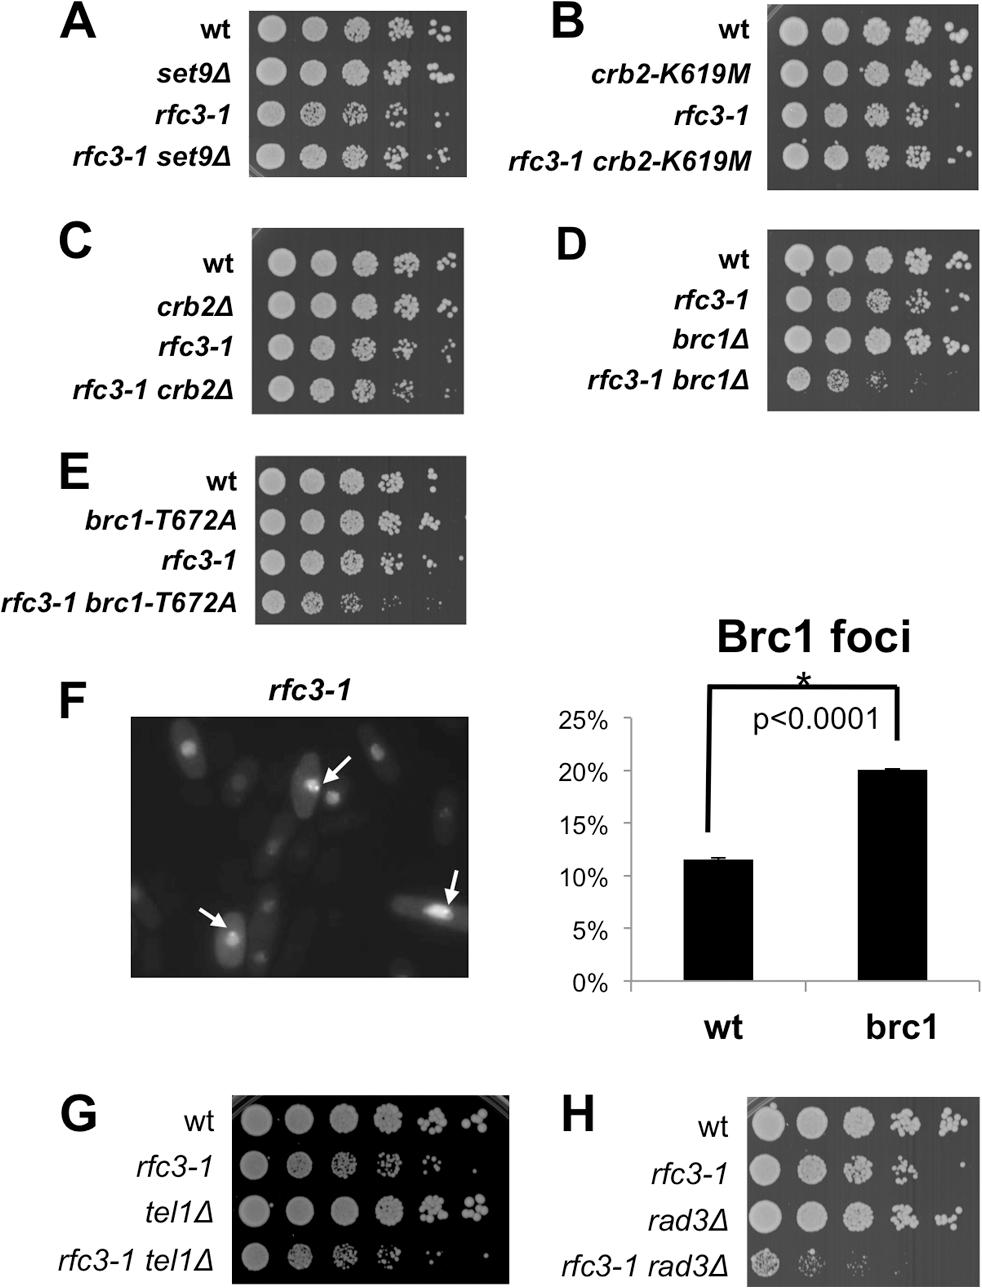 Brc1 binding to γH2A is critical in <i>rfc3-1</i> cells.